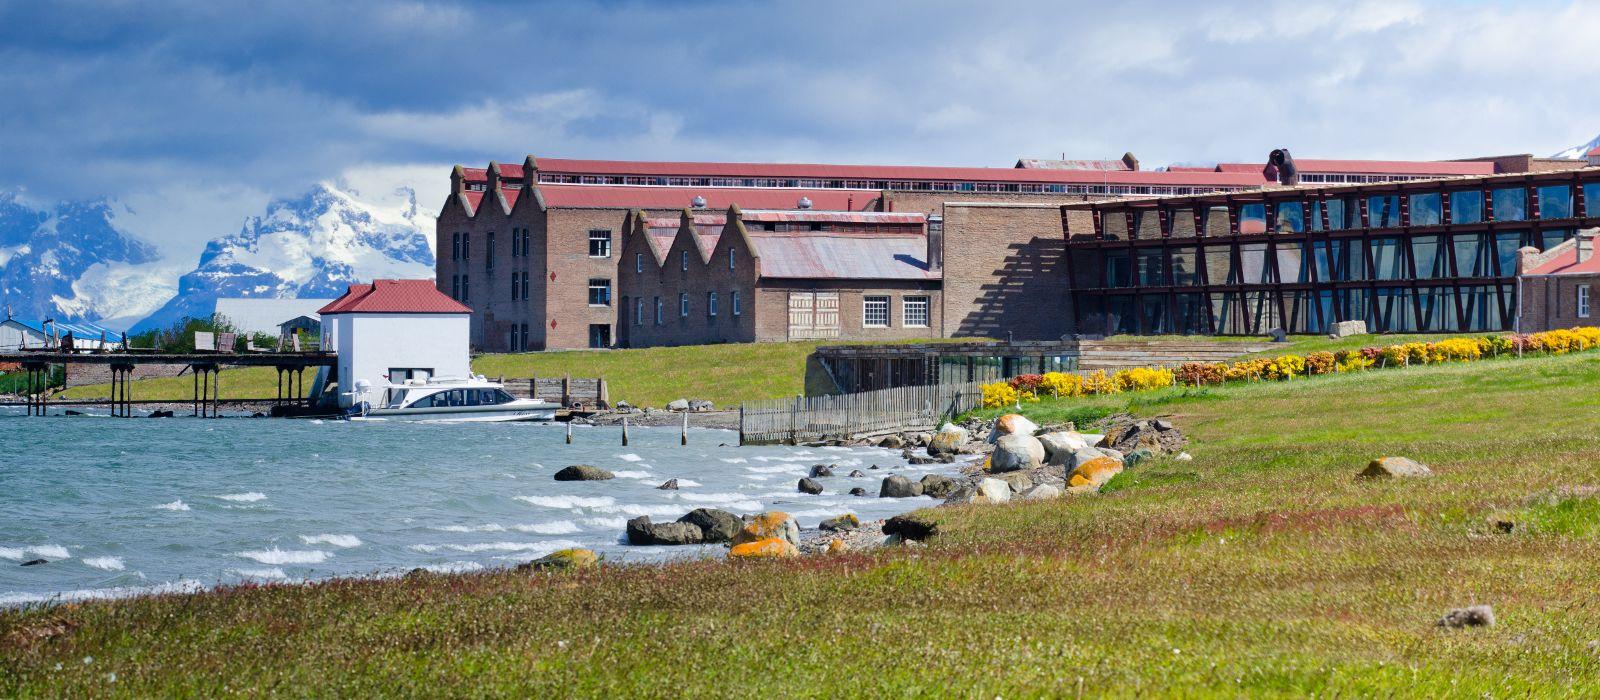 Hotel The Singular Patagonia, Puerto Bories Chile